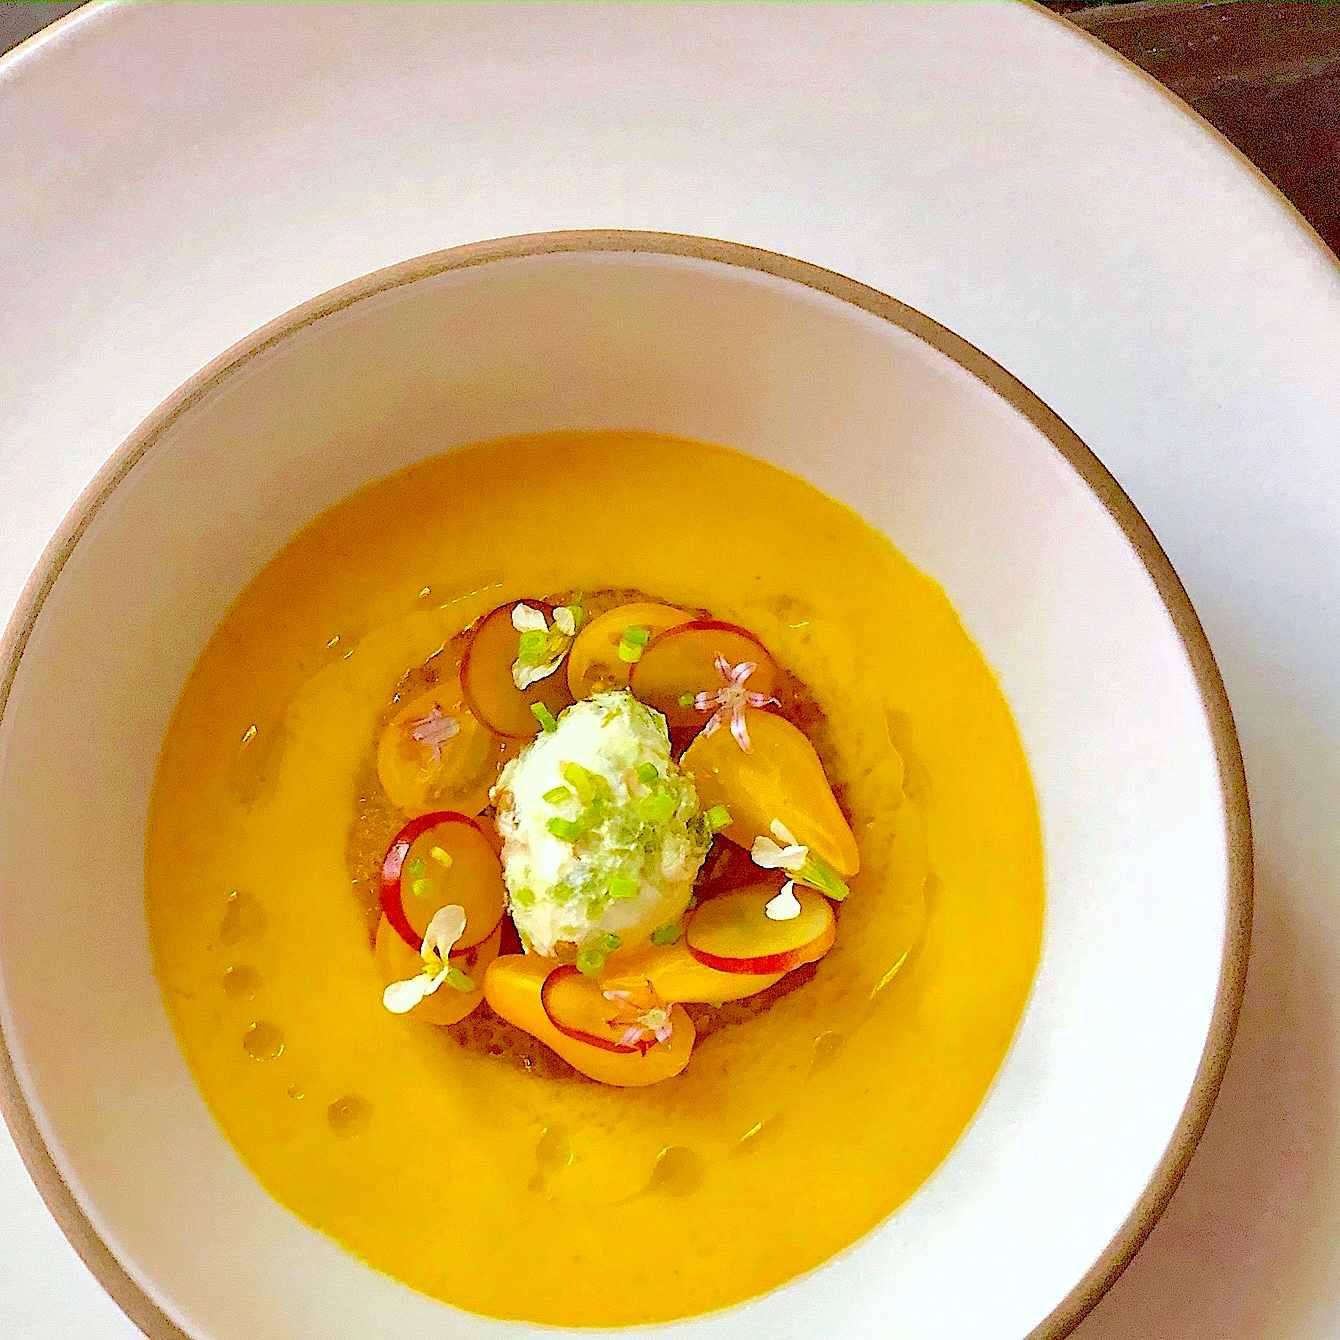 gazpacho recipe with Yellow squash